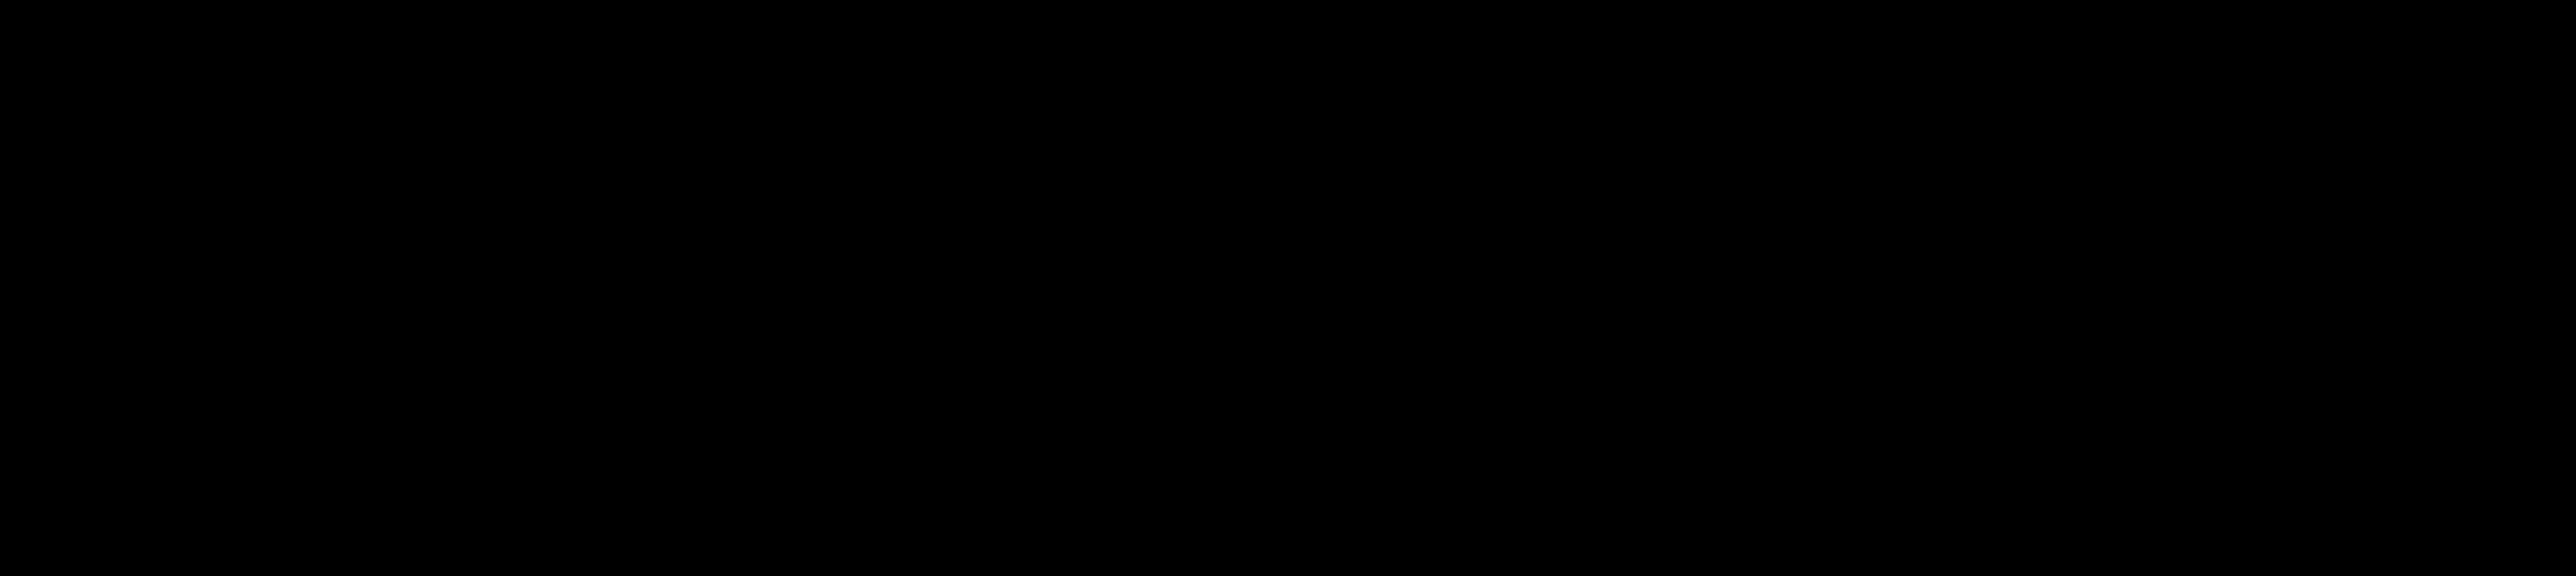 WhiteOps_Logo_Black.png